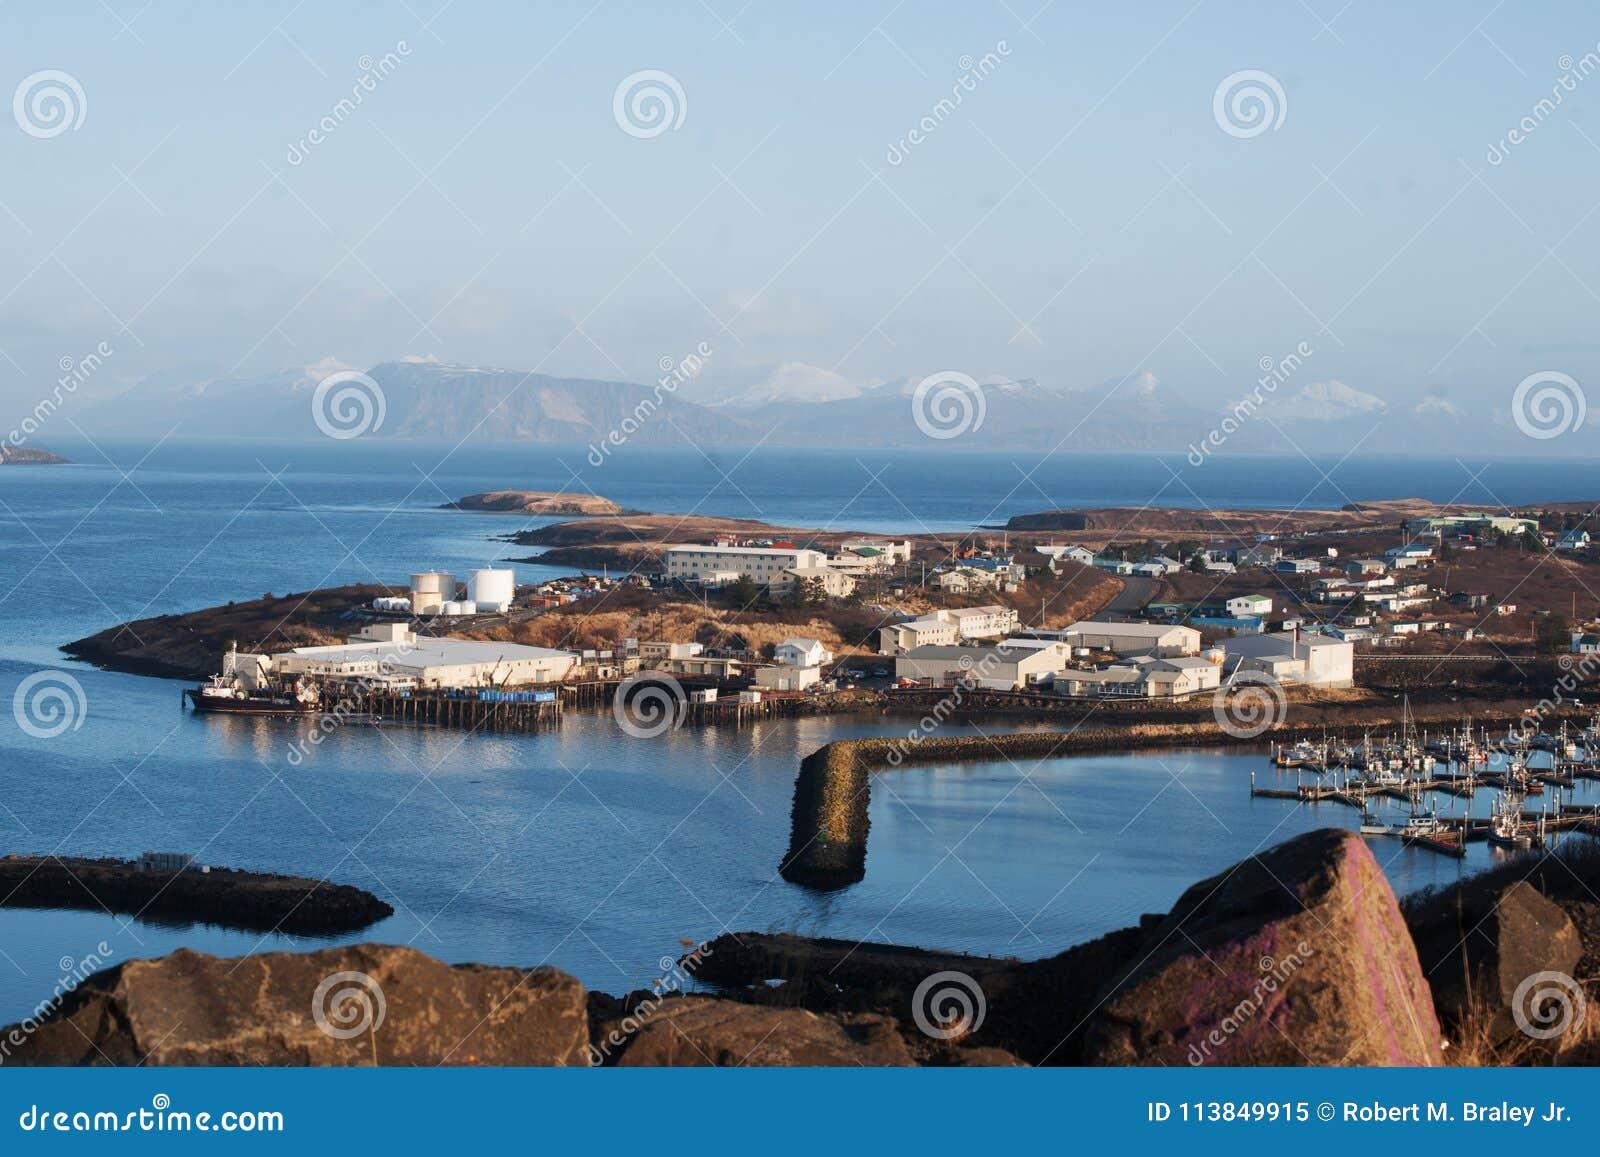 Download Sand Point Alaska stock image. Image of akstp2018012300001 - 113849915